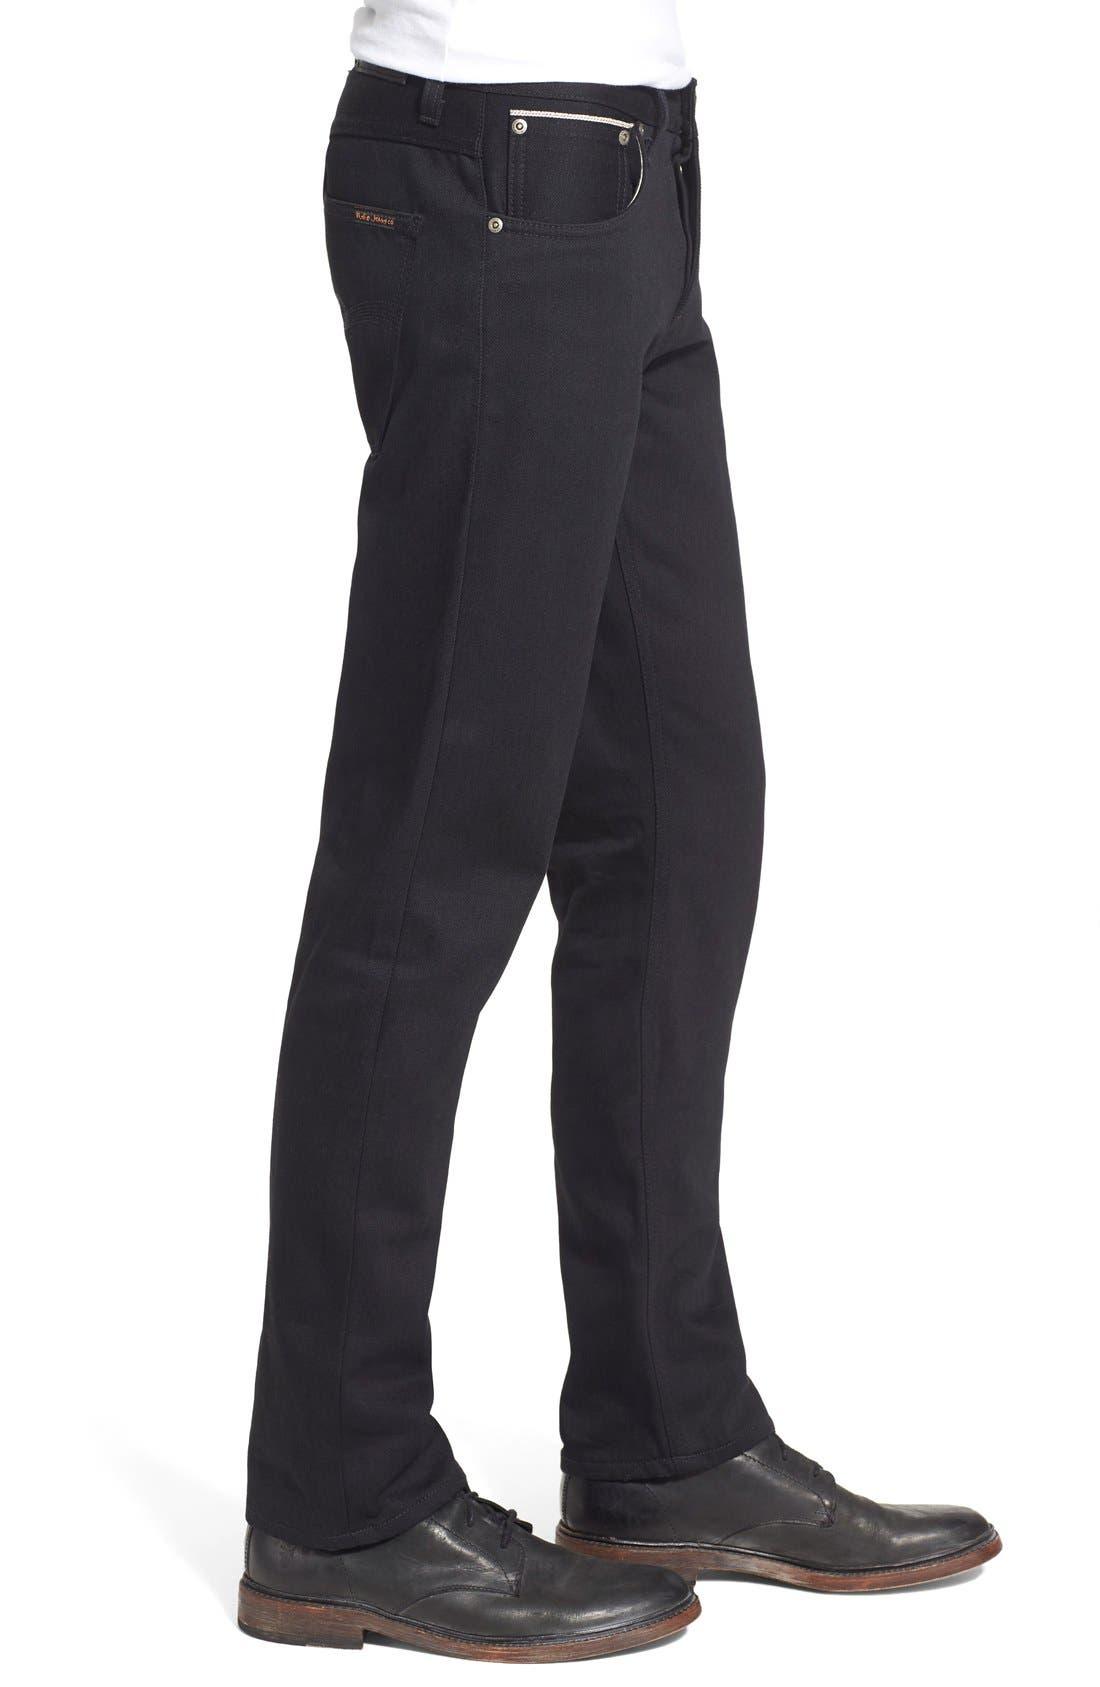 NUDIE JEANS,                             'Grim Tim' Slim Fit Raw Selvedge Jeans,                             Alternate thumbnail 4, color,                             001